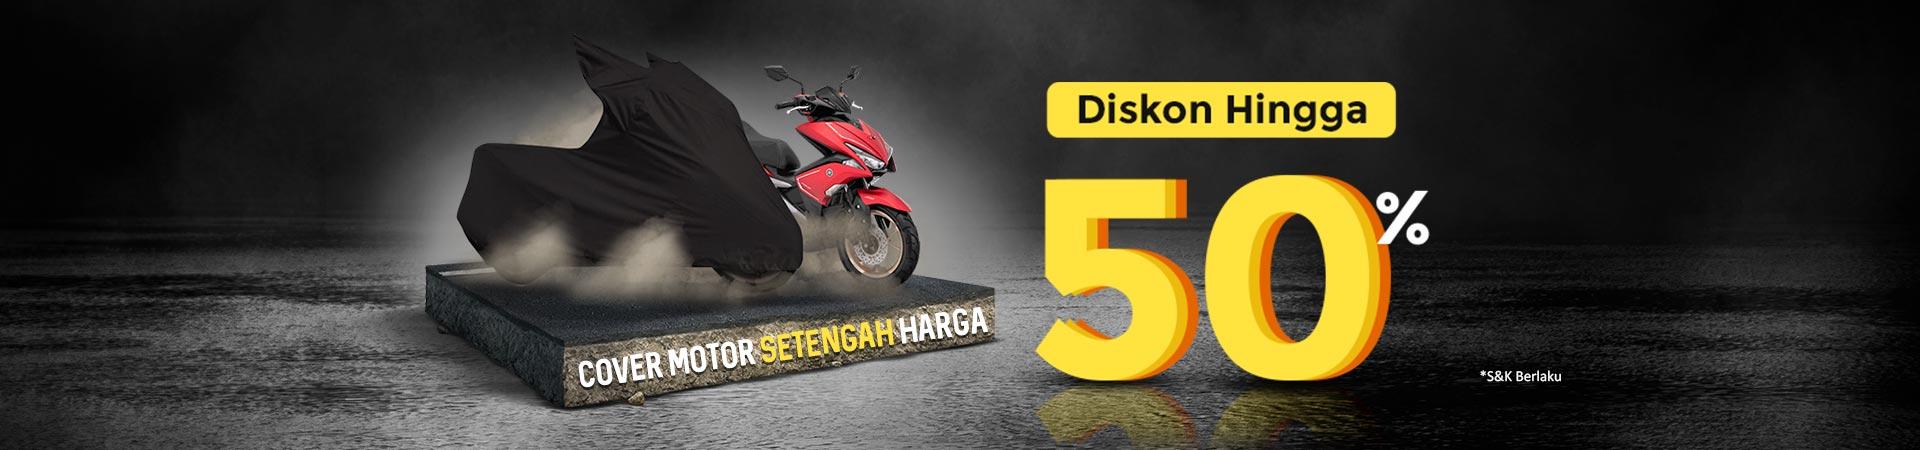 Diskon Cover Motor Setengah Harga